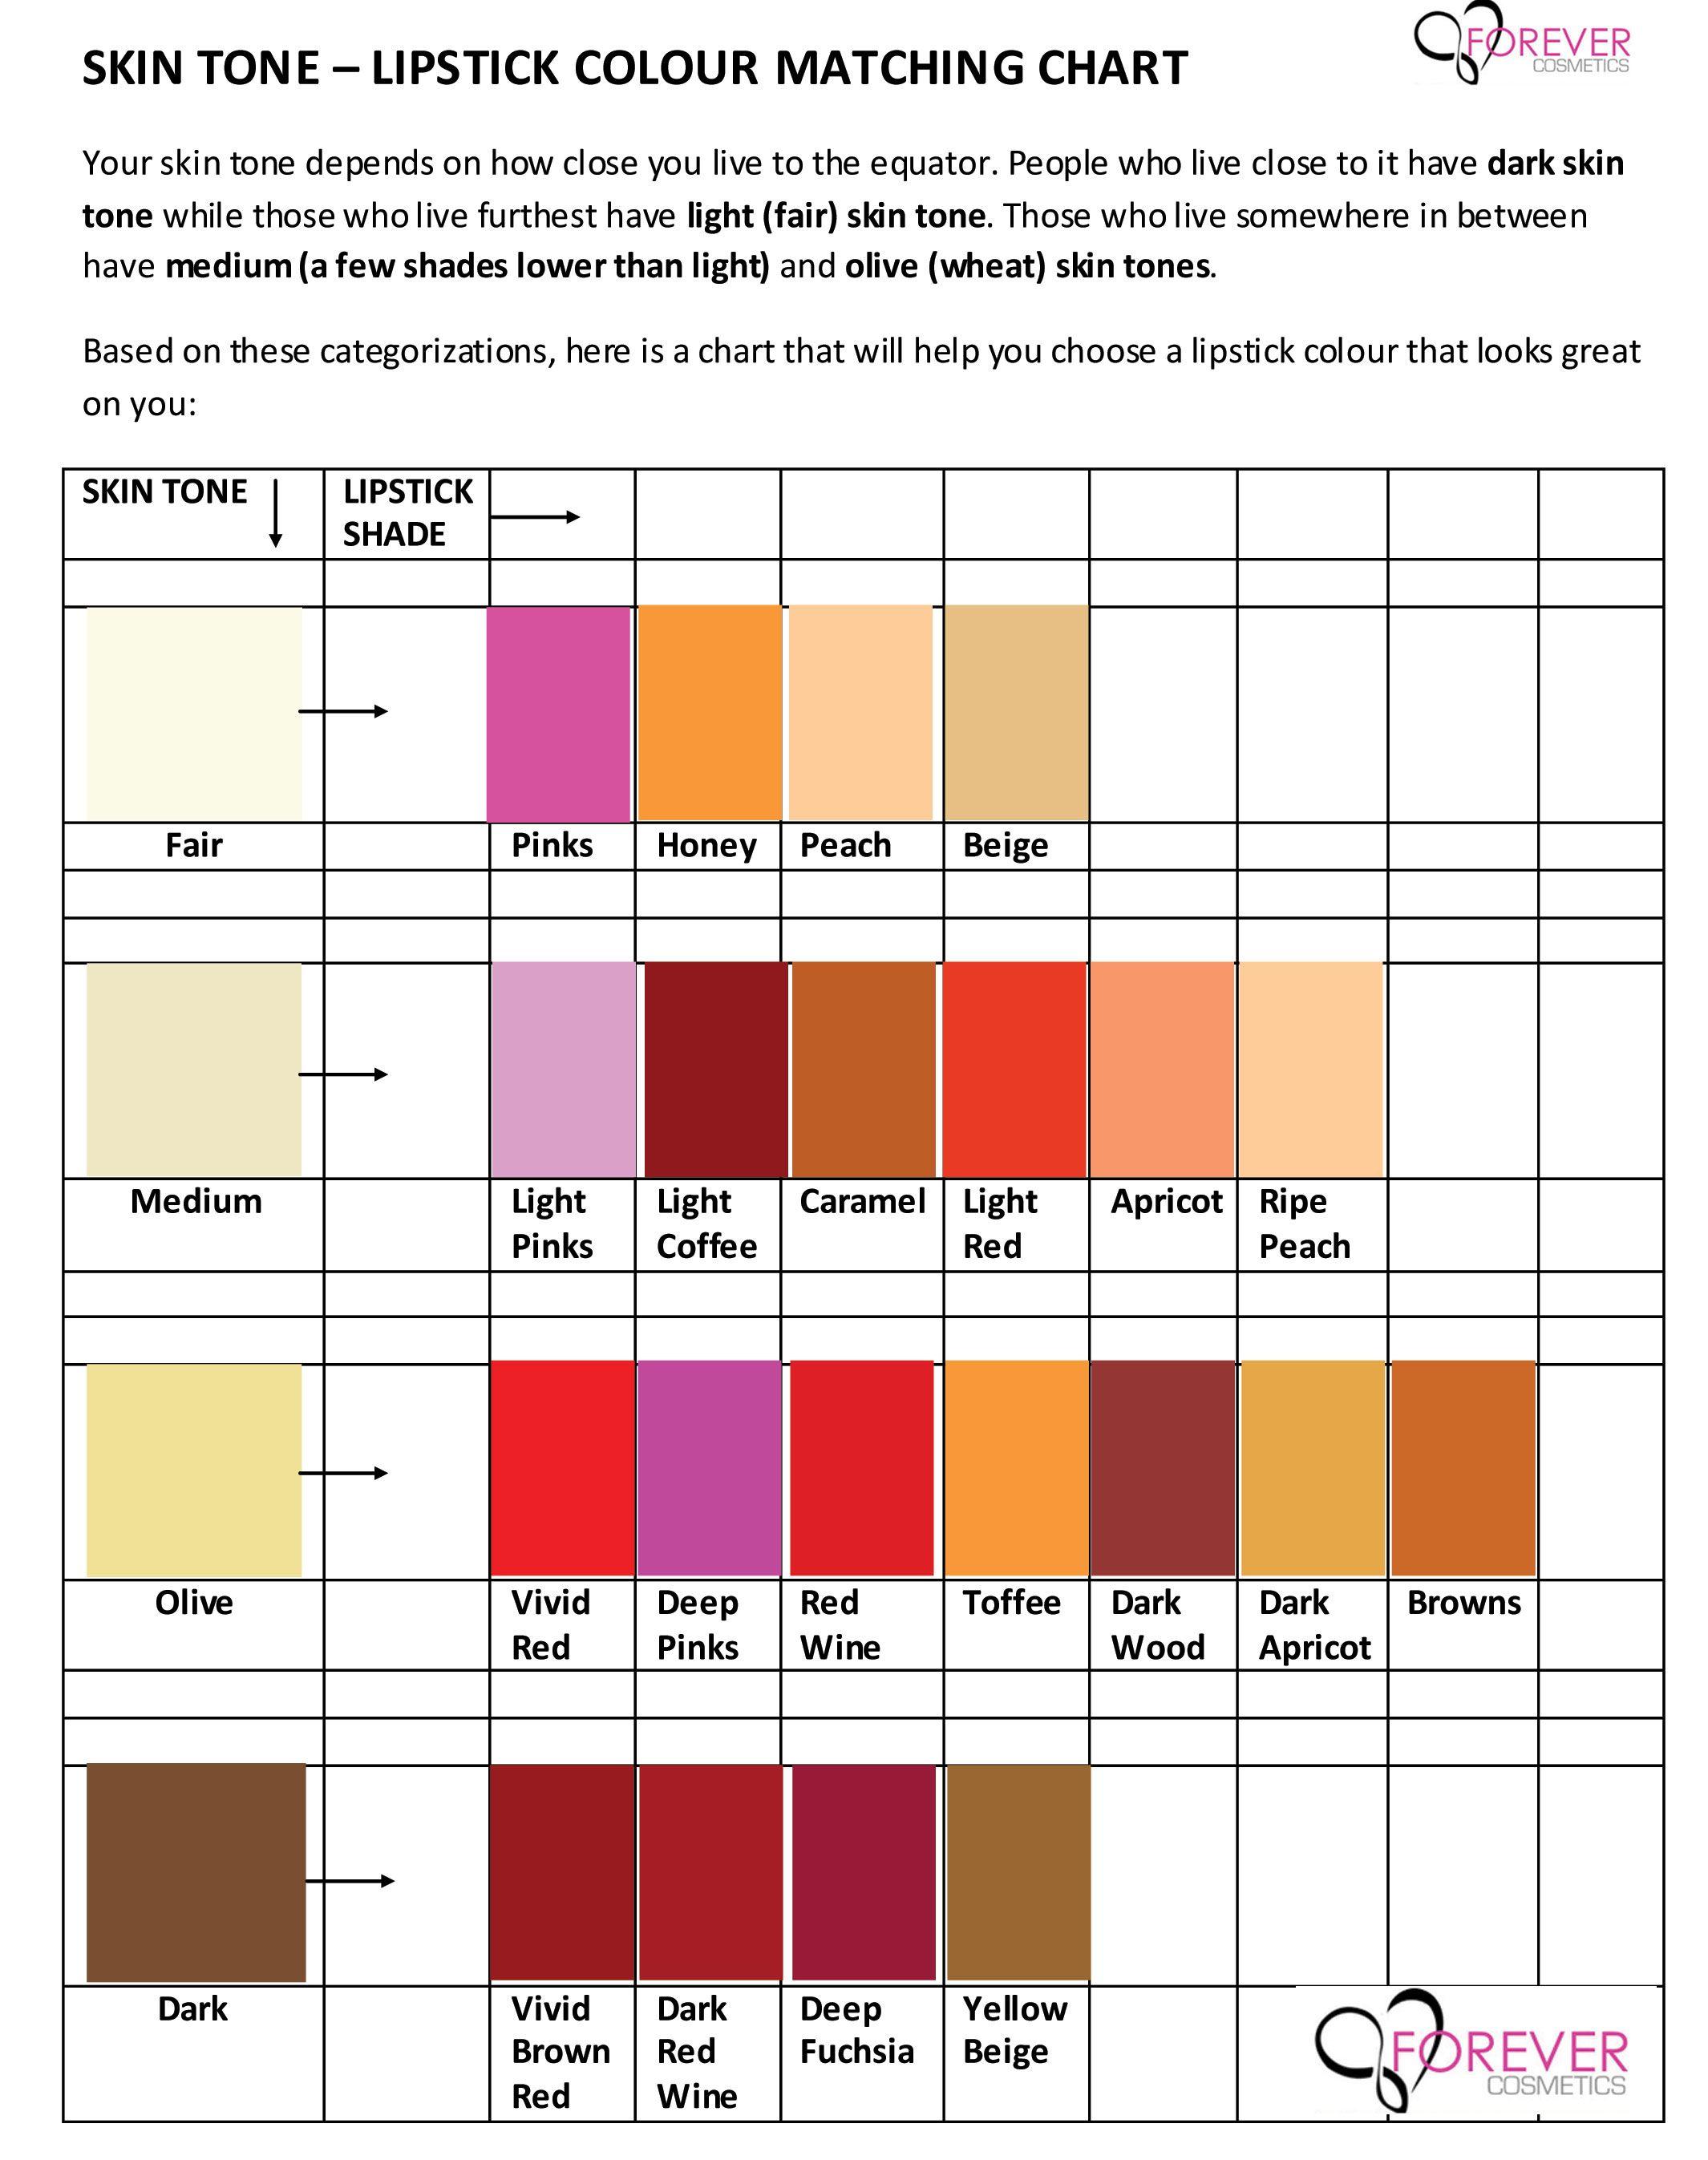 Skin Tone Lipstick Colour Matching Chart Your Skin Tone